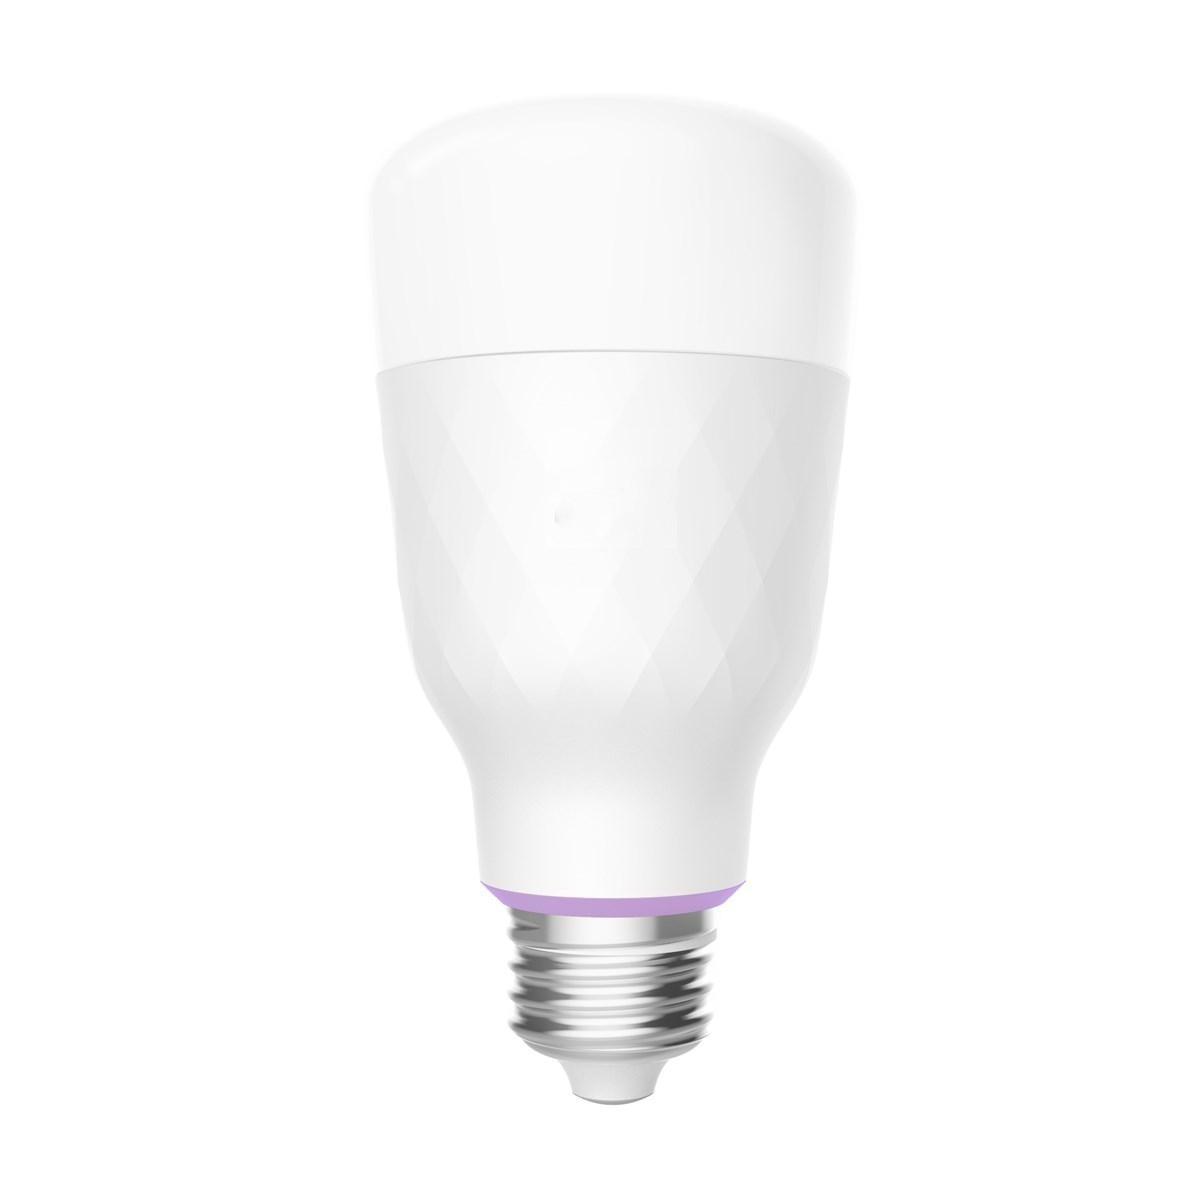 YLDP06YL E26 E27 10 W RGBW ampoule LED intelligente Contrôle De L'application Wifi AC100-240V MORUE - 3